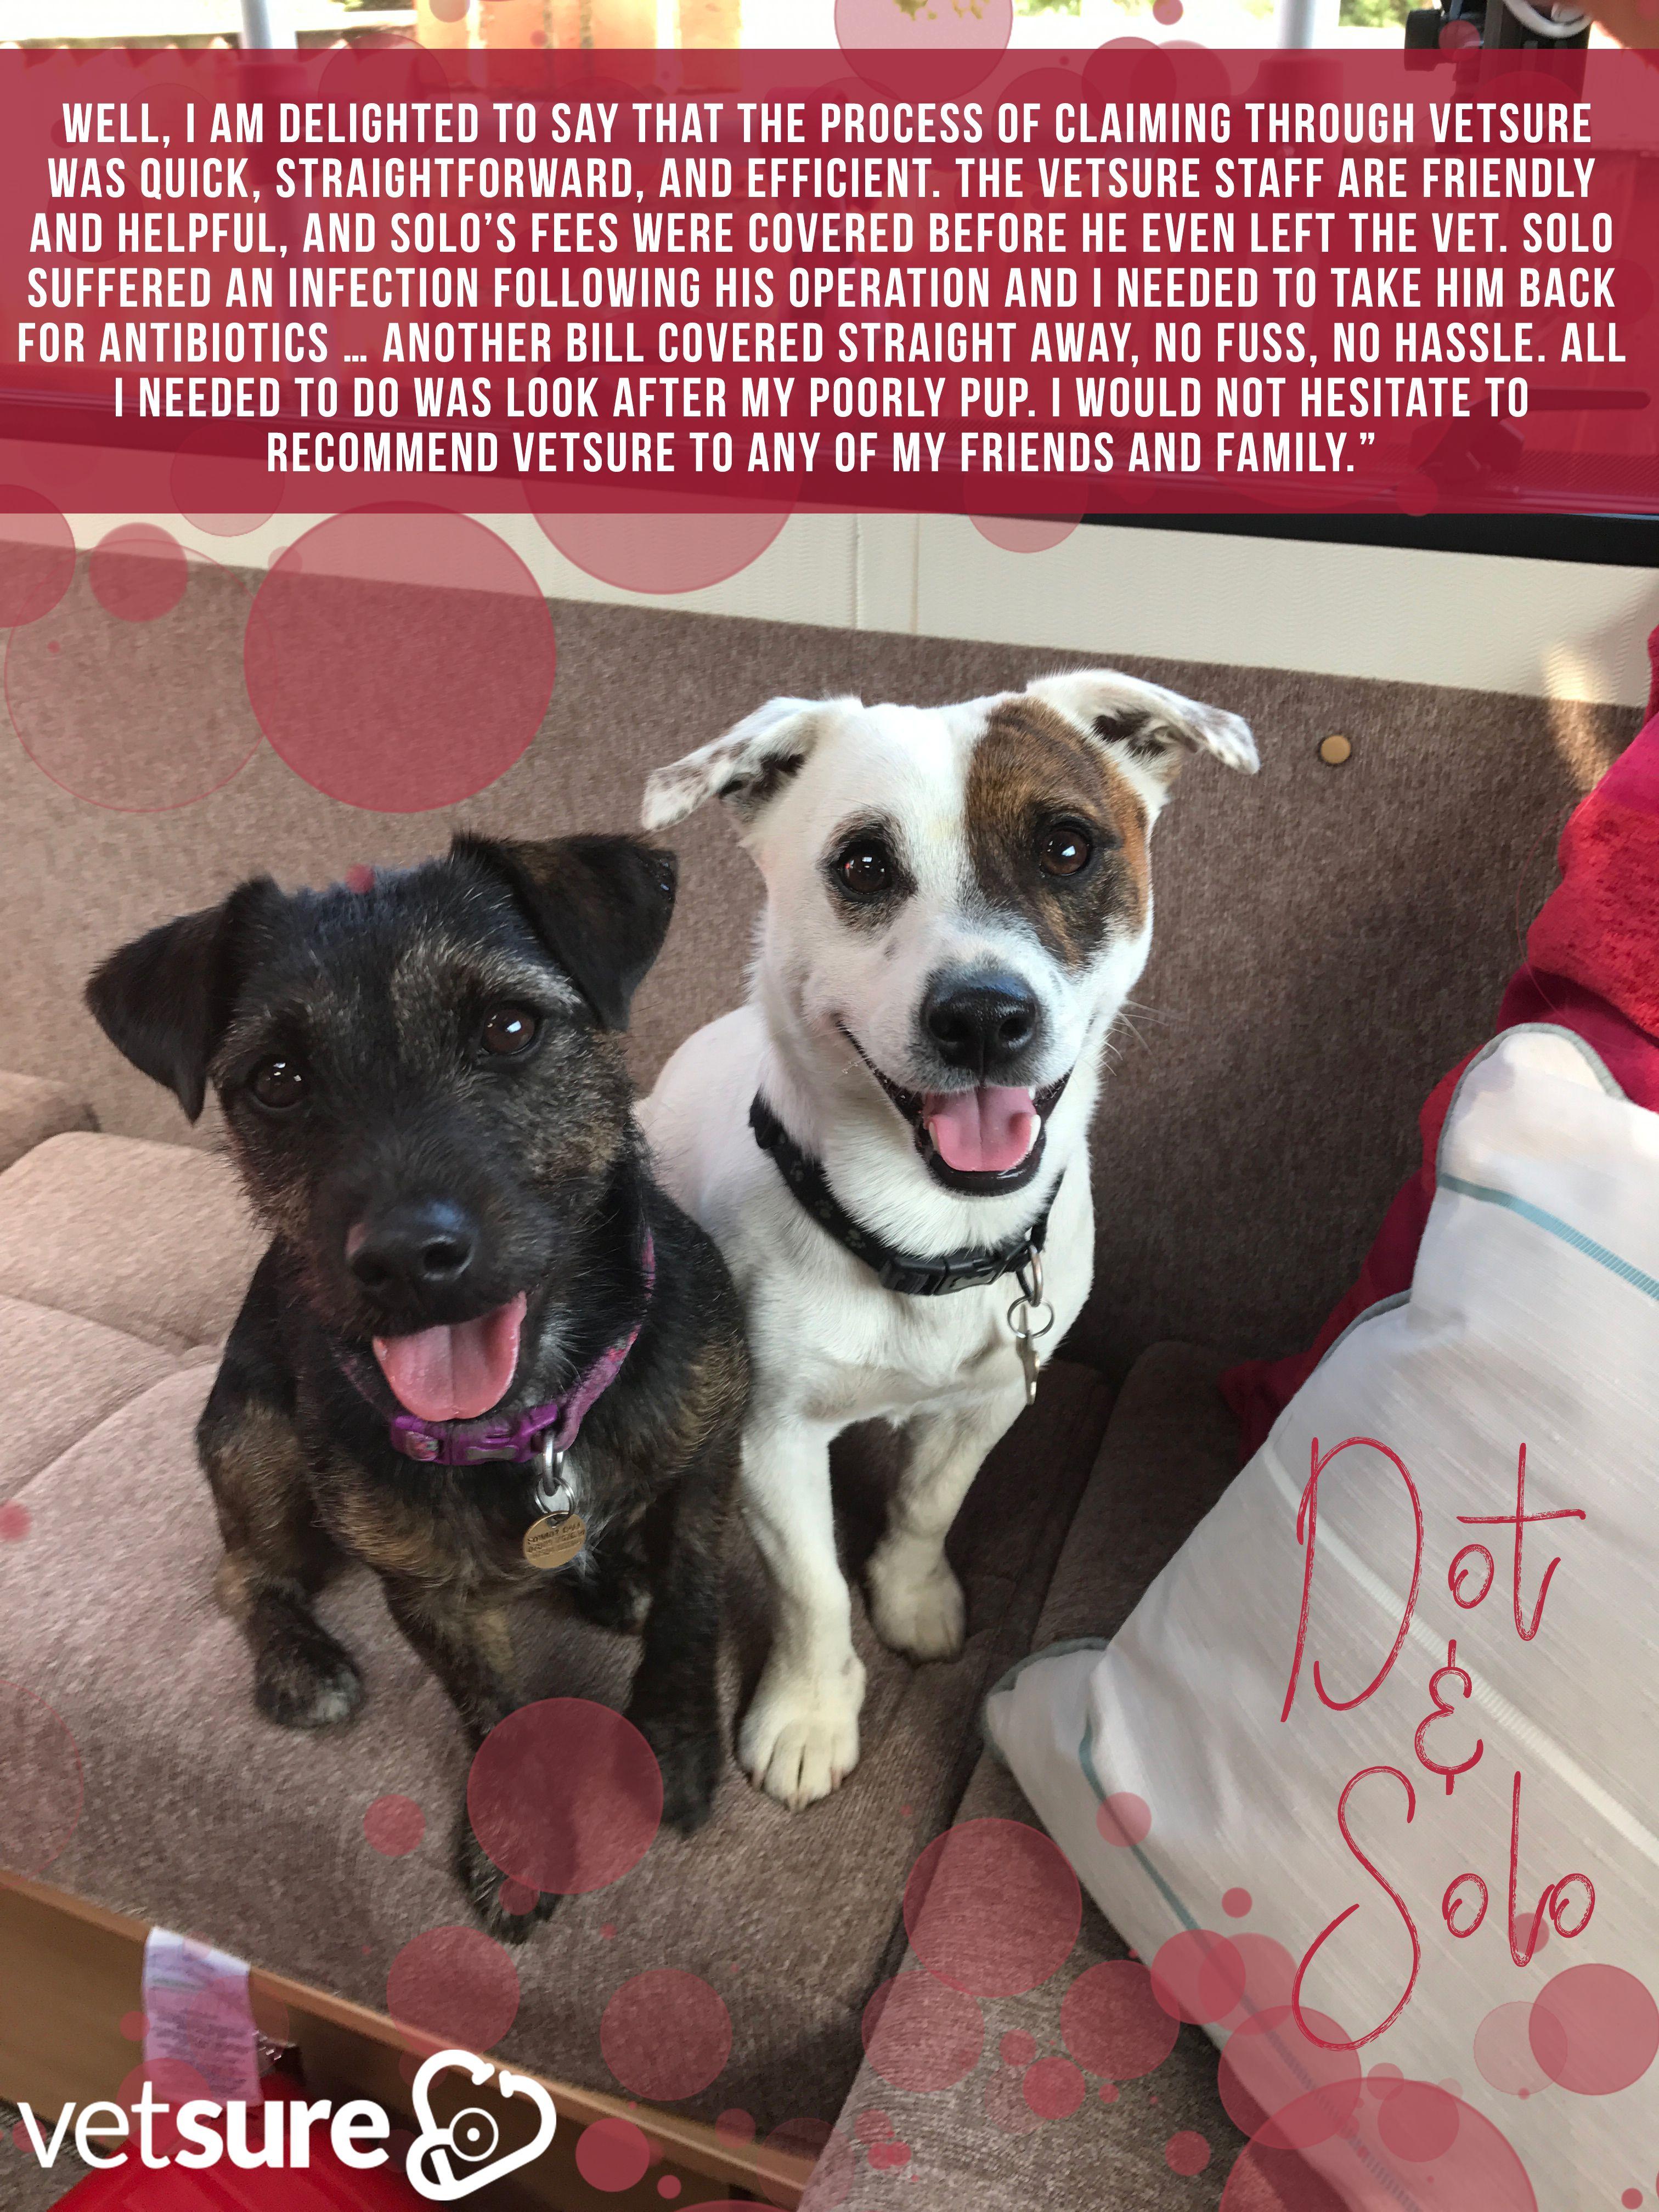 solo dot pair jackrussellterrier petinsurance puppy